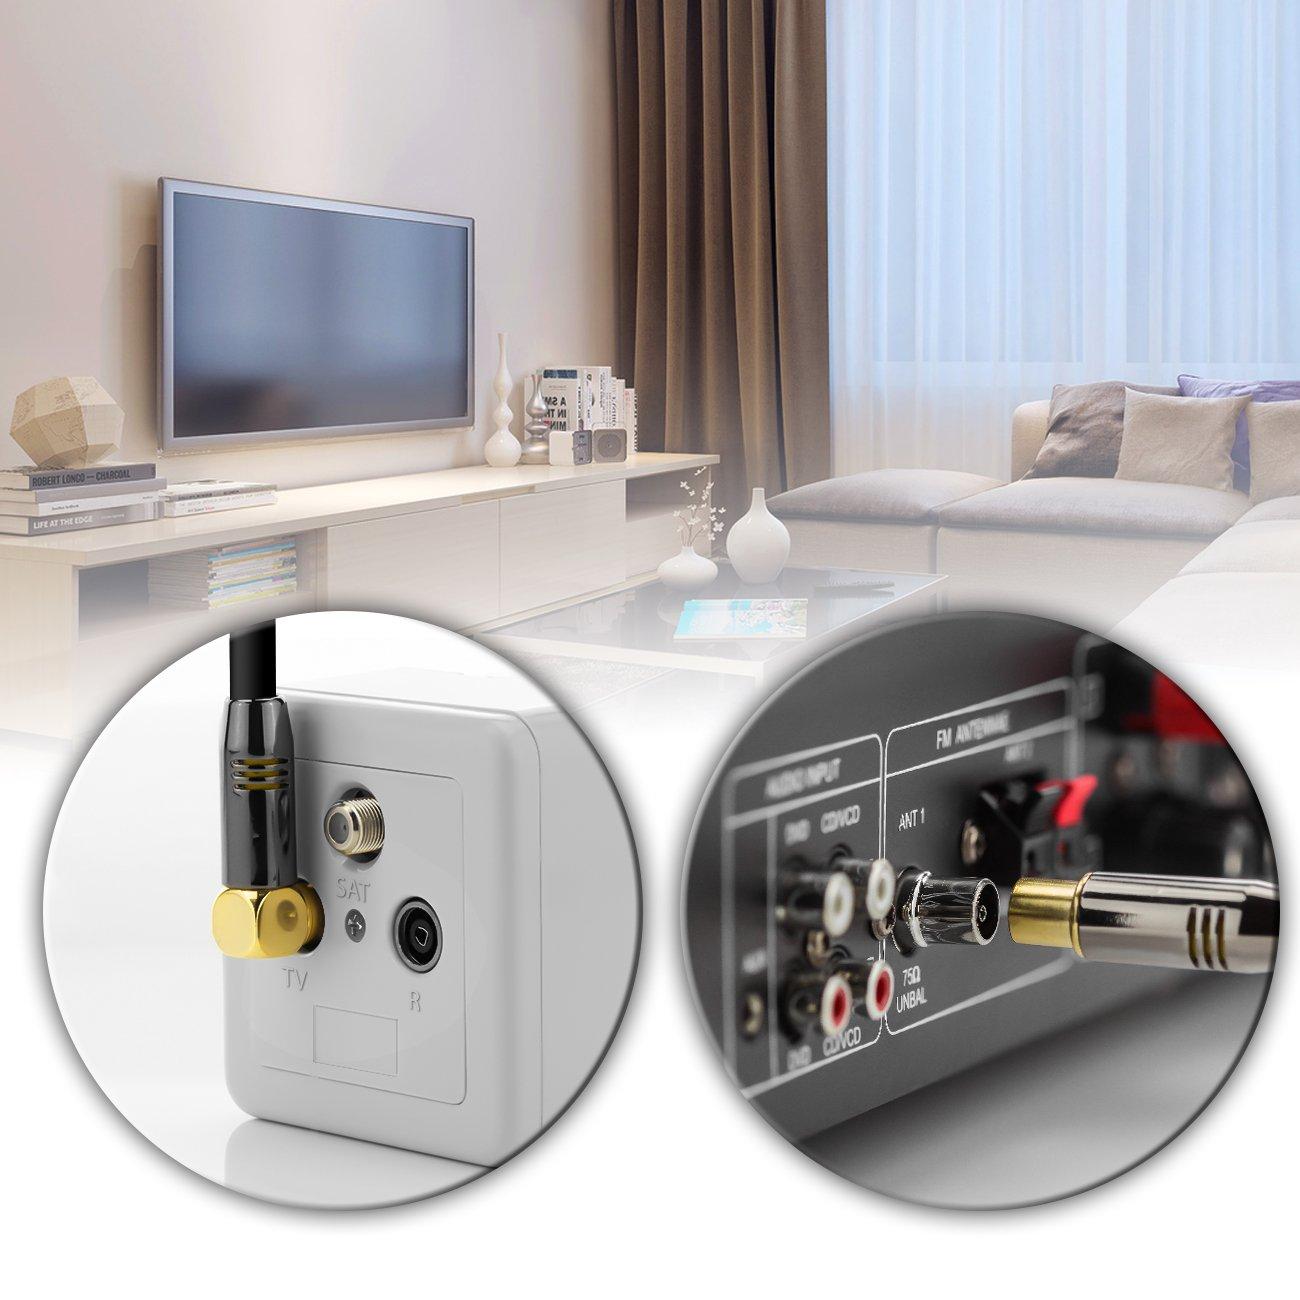 90/° Grad Wei/ß 1x gewinkelt - Metallstecker deleyCON 12,5m TV Antennenkabel HDTV Full HD gerade zu TV-Buchse Koaxialkabel TV-Stecker